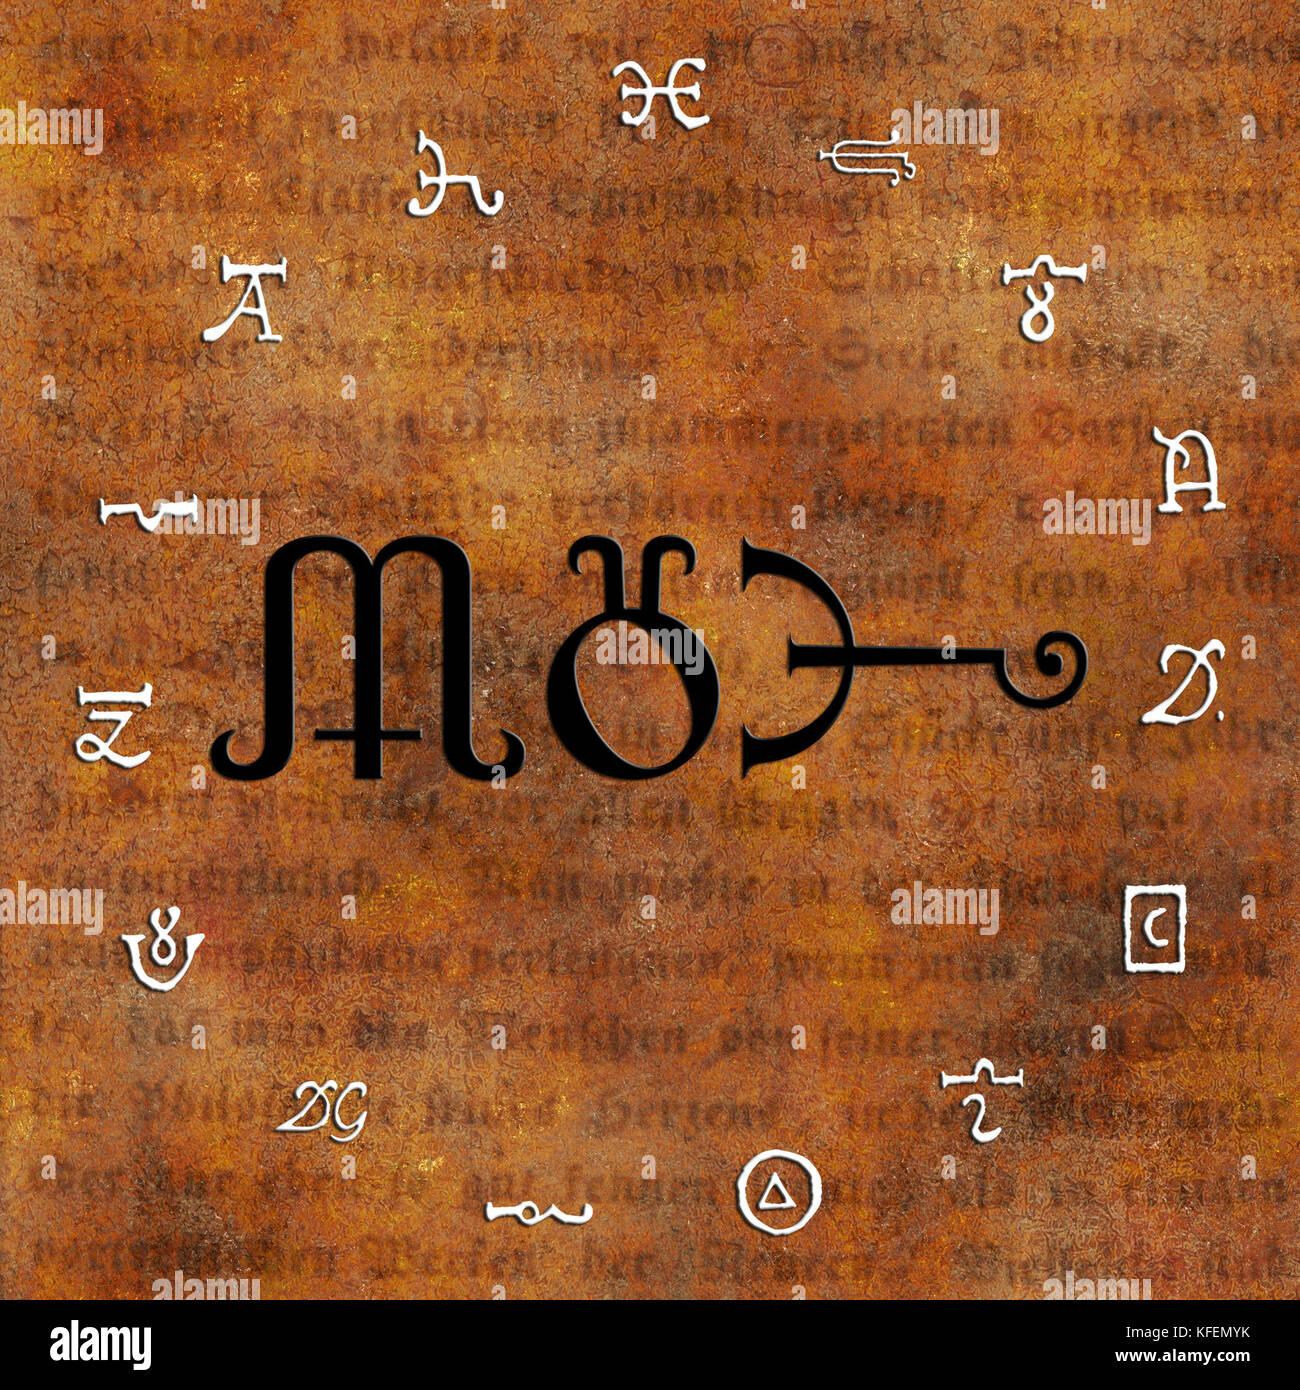 circle with alchemy symbols - Stock Image